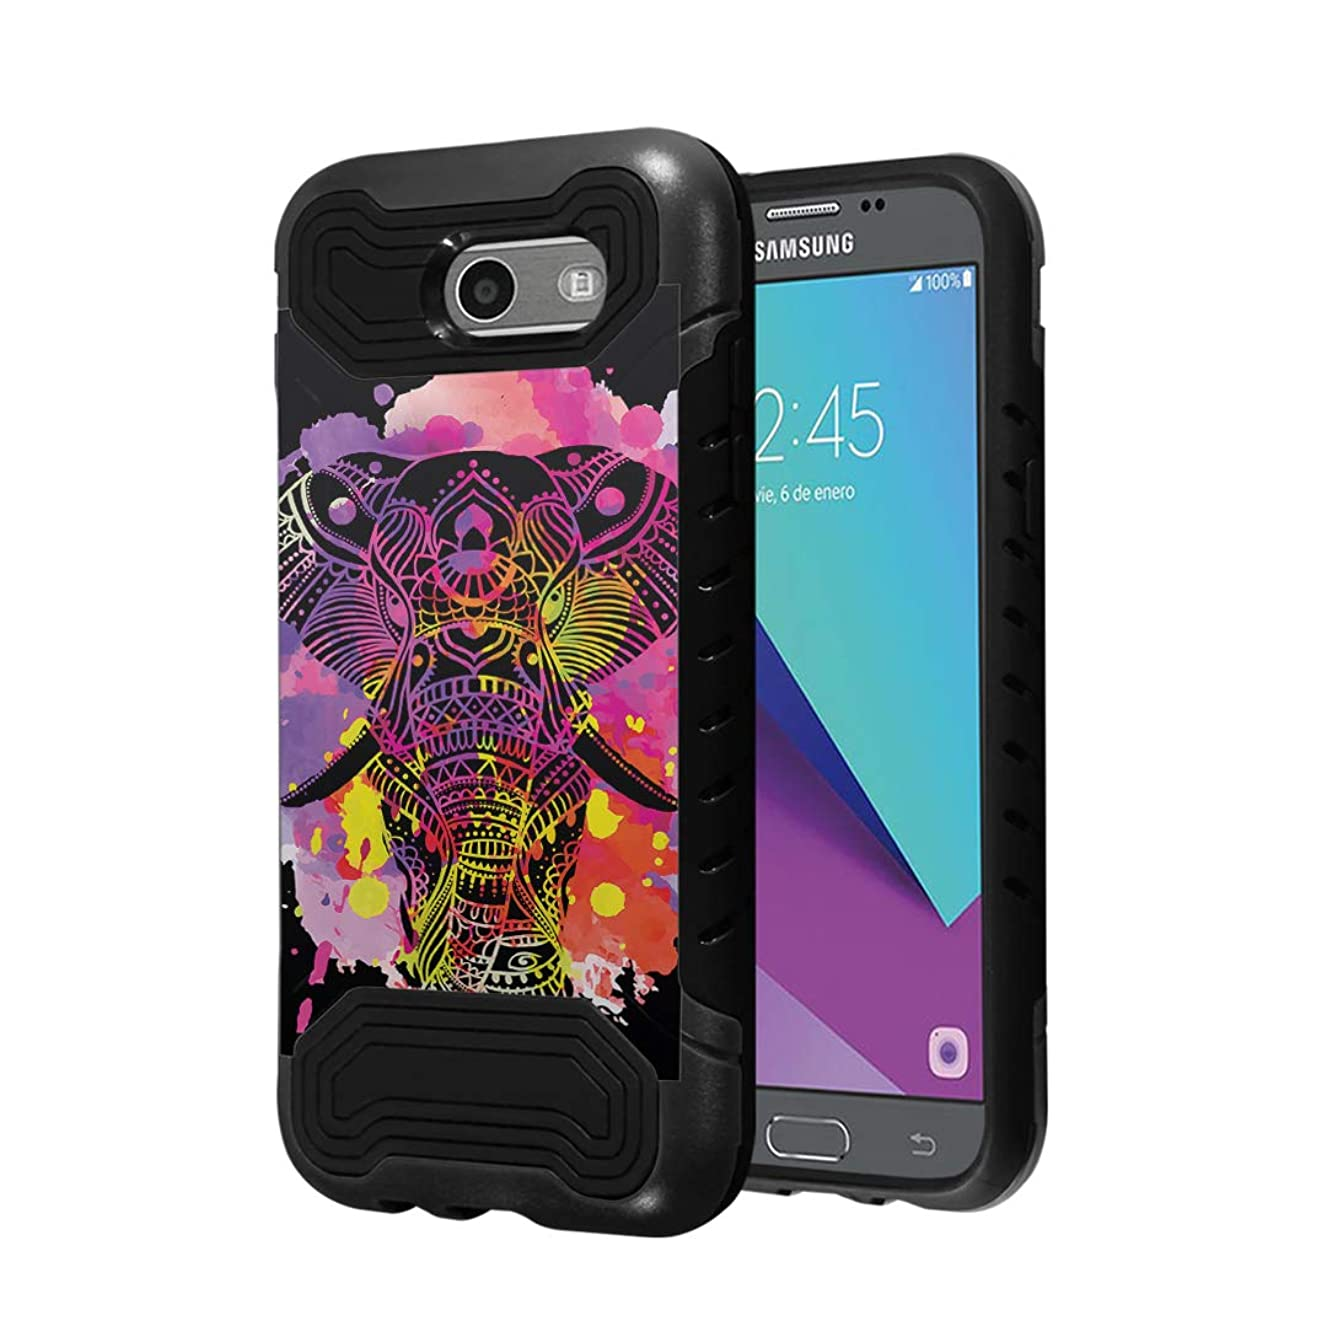 Capsule Case Compatible with Samsung Galaxy J7 Prime, J7 Perx, J7 Sky Pro, J7 V, Galaxy Halo [Quantum Dual Layer Slim Case Black] for Galaxy J7 SM-J727 Year 2017 - (Watercolor Splash Elephant)